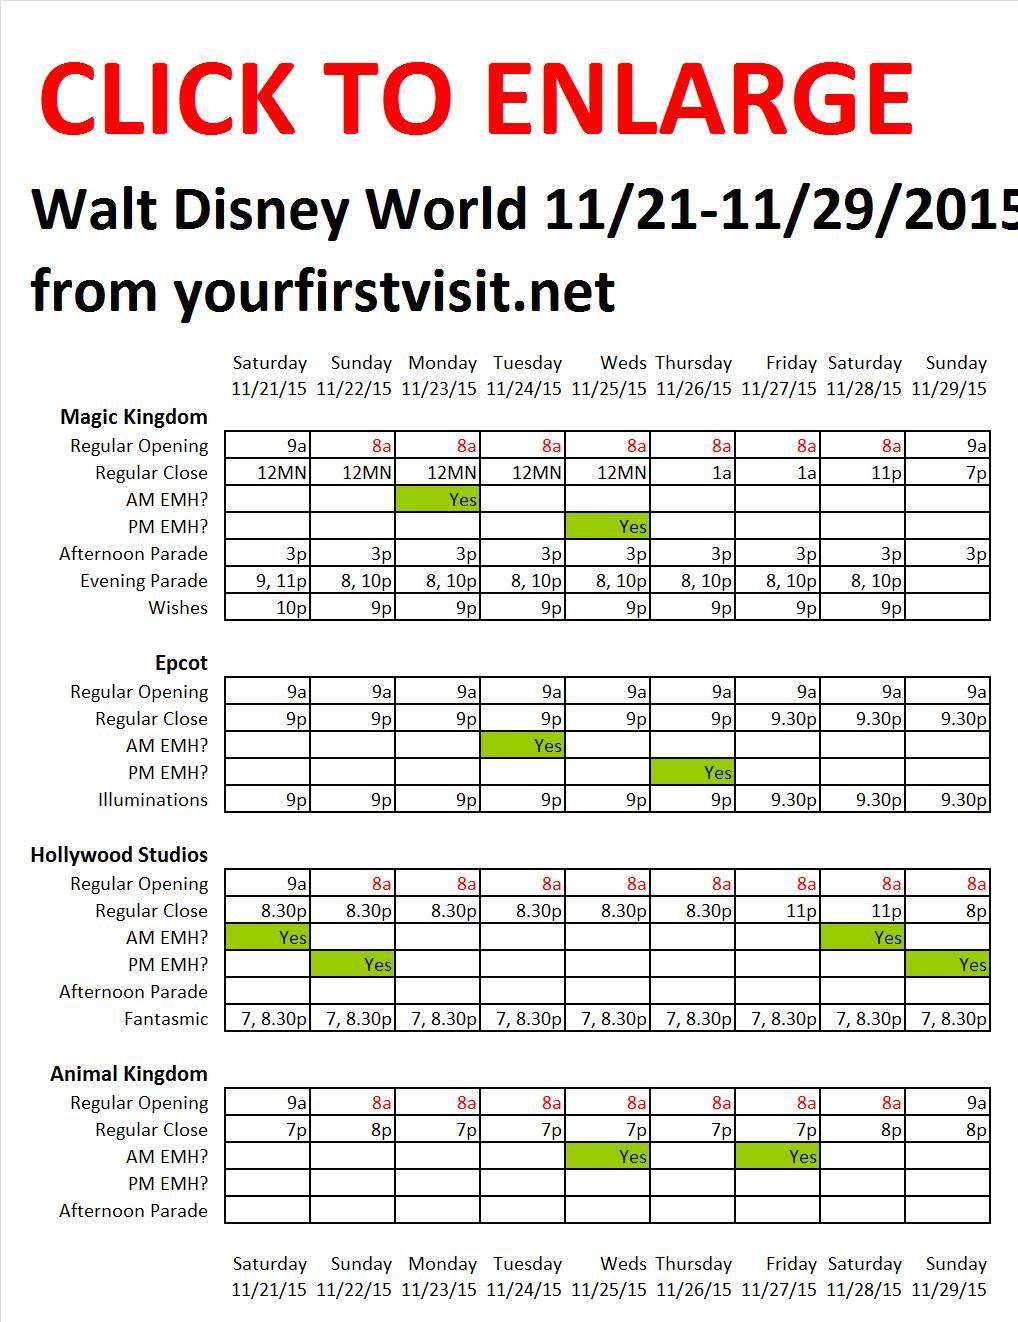 Disney World 11-21 to 11-29-2015 from yourfirstvisit.net